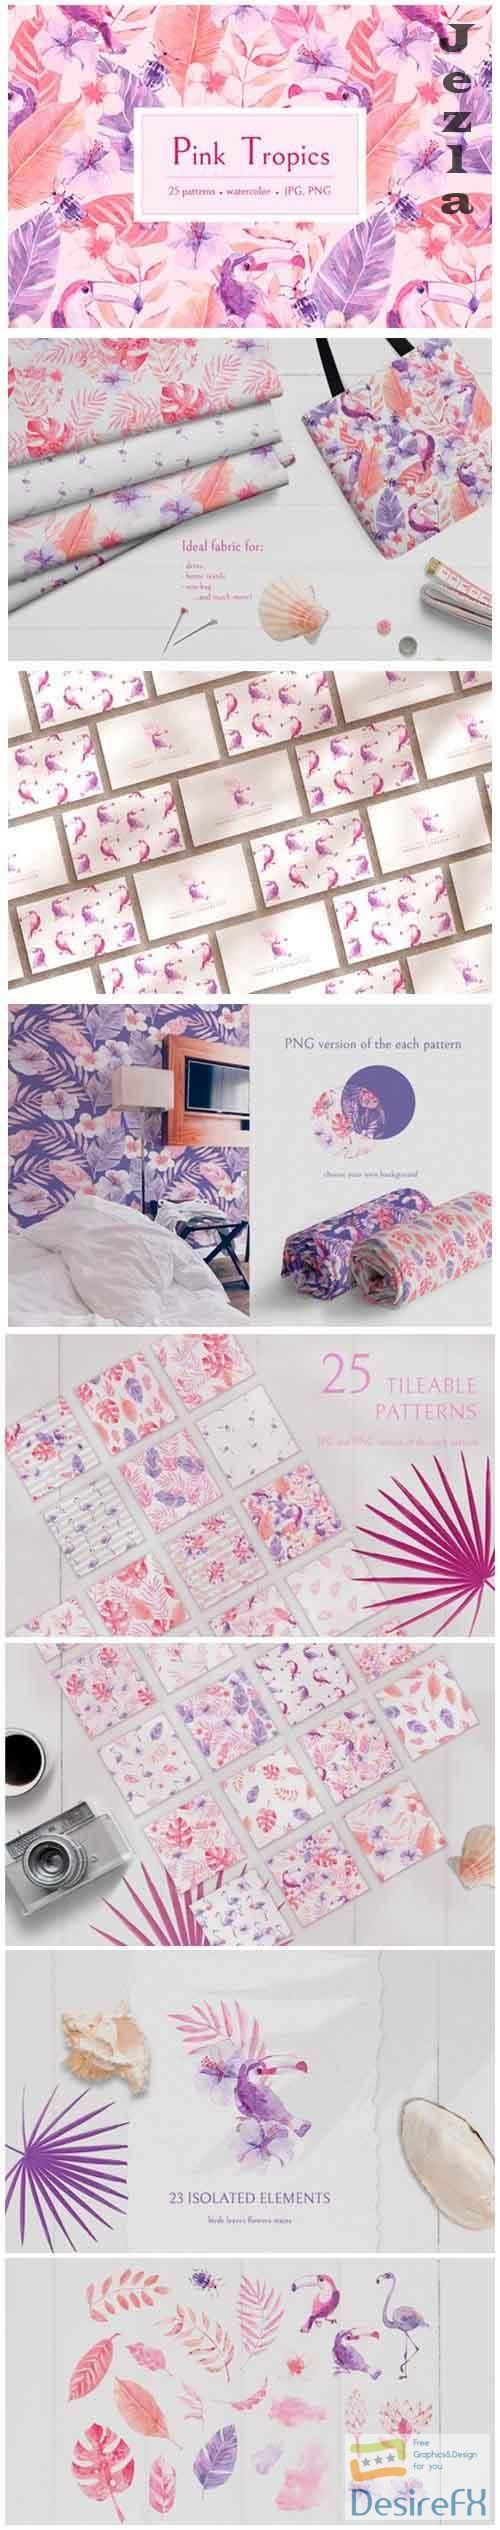 Pink Tropics Patterns 5069676